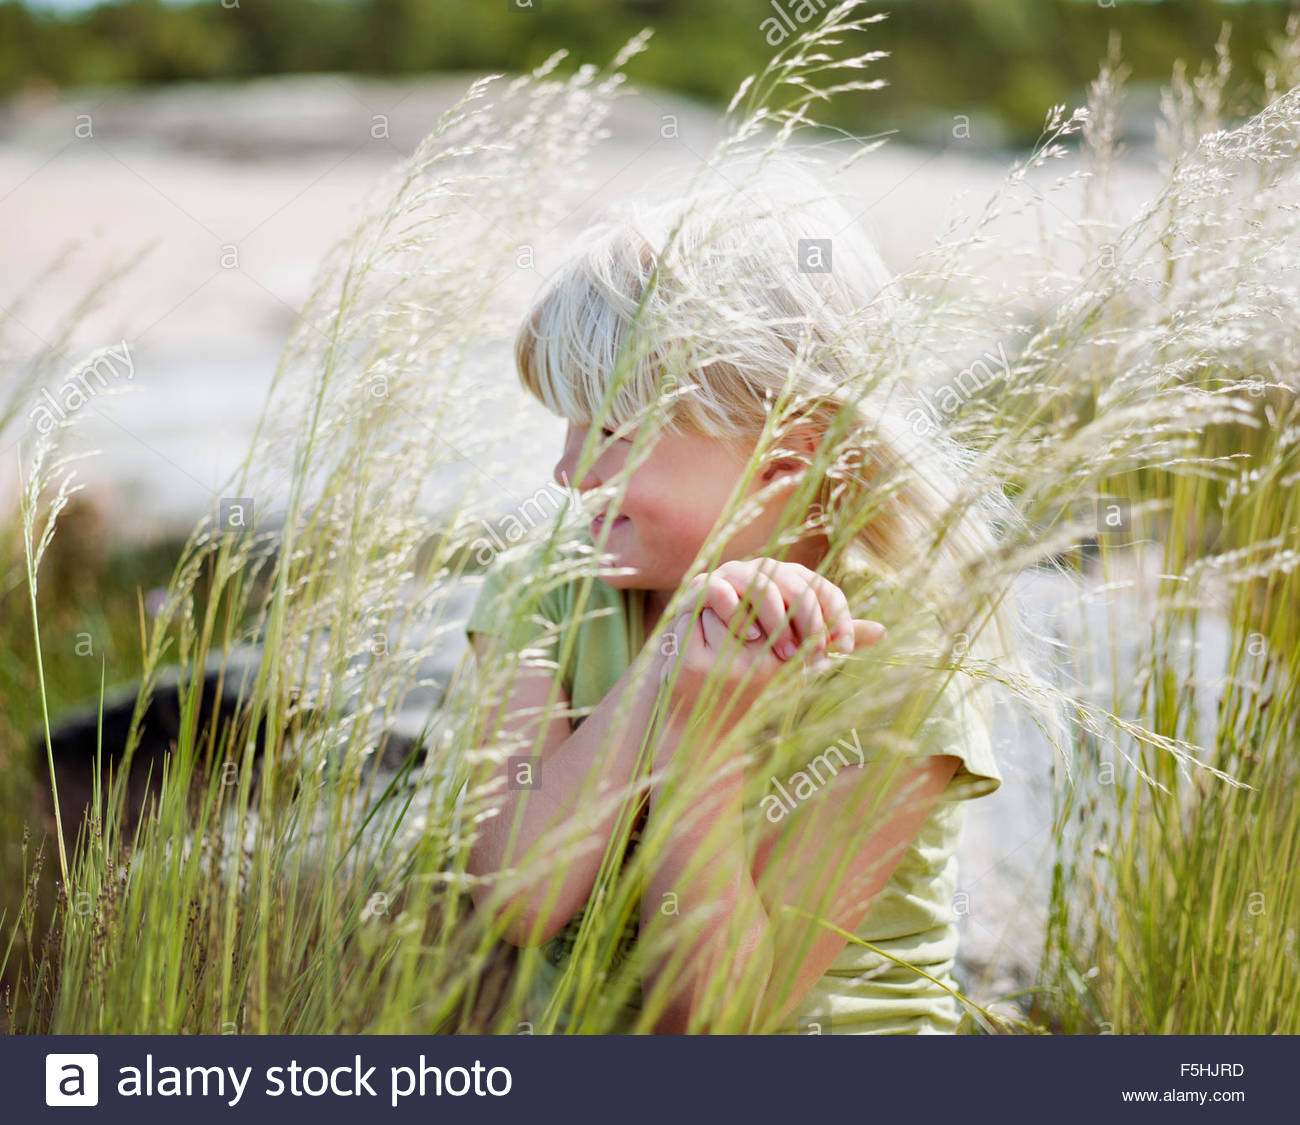 Sweden, Stockholm Archipelago, Uppland, Arholma, Girl (6-7) behind tall grass - Stock Image